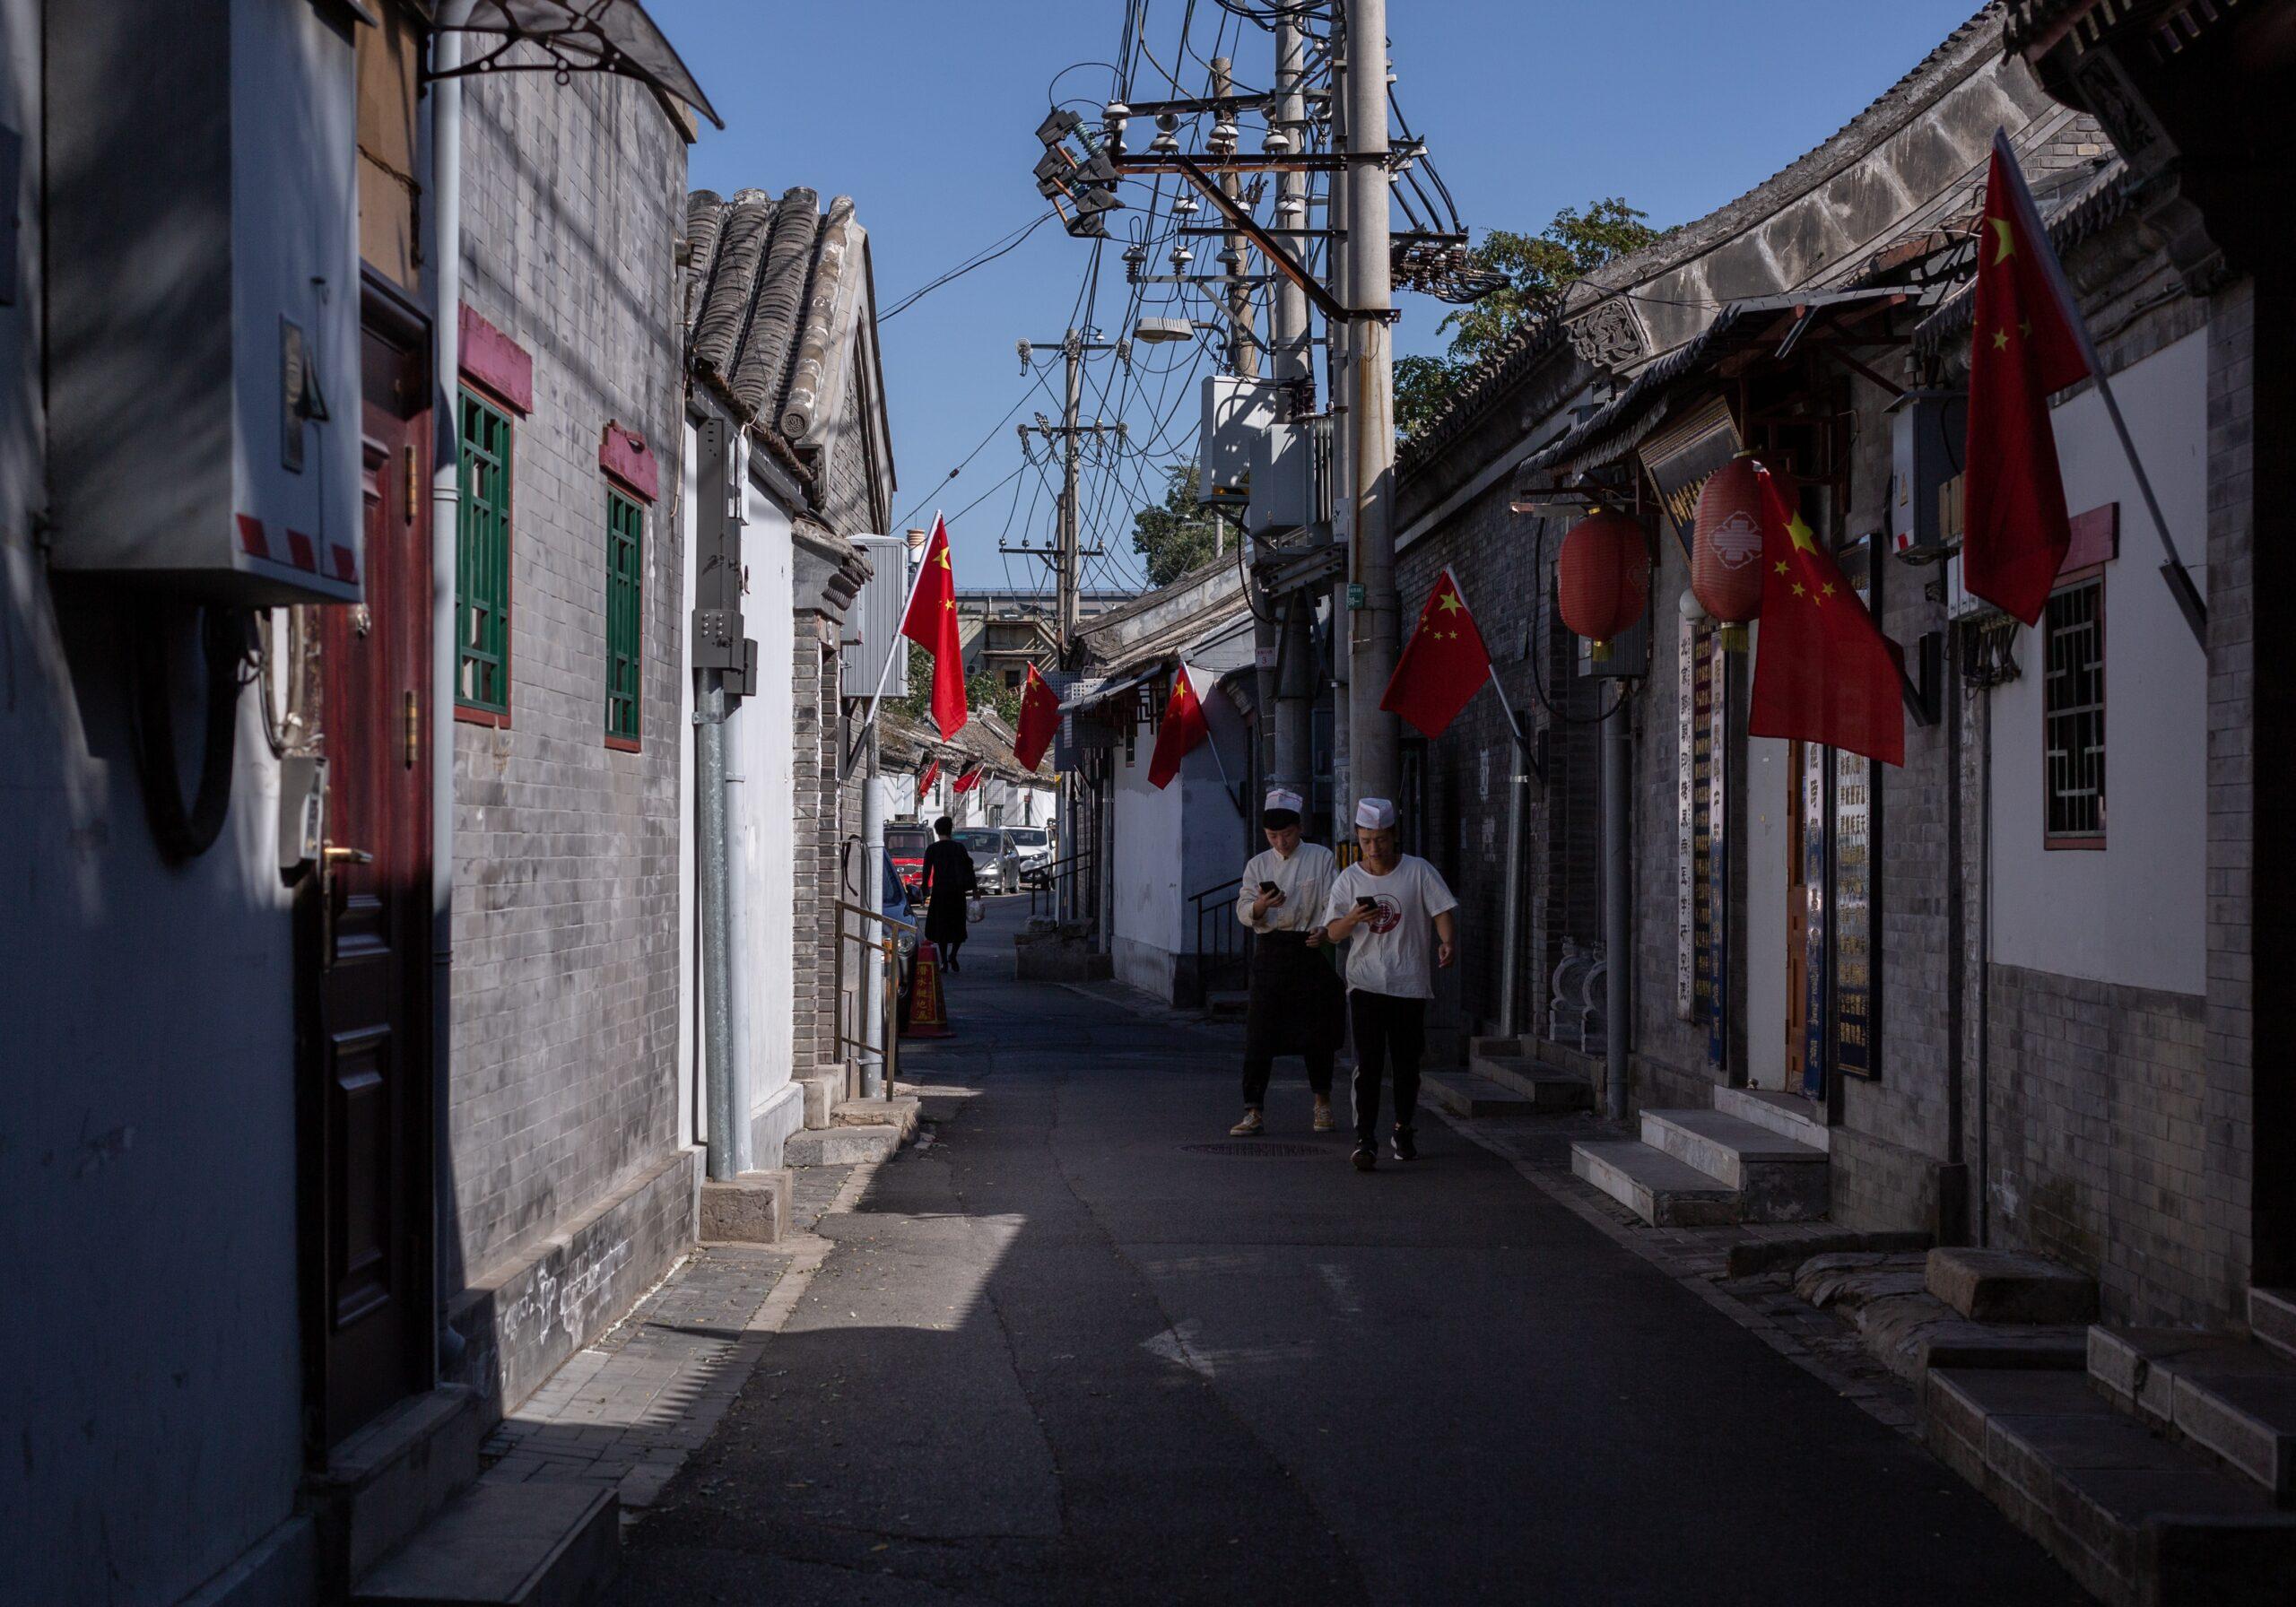 Calle tradicional, hutong, Pekín, china